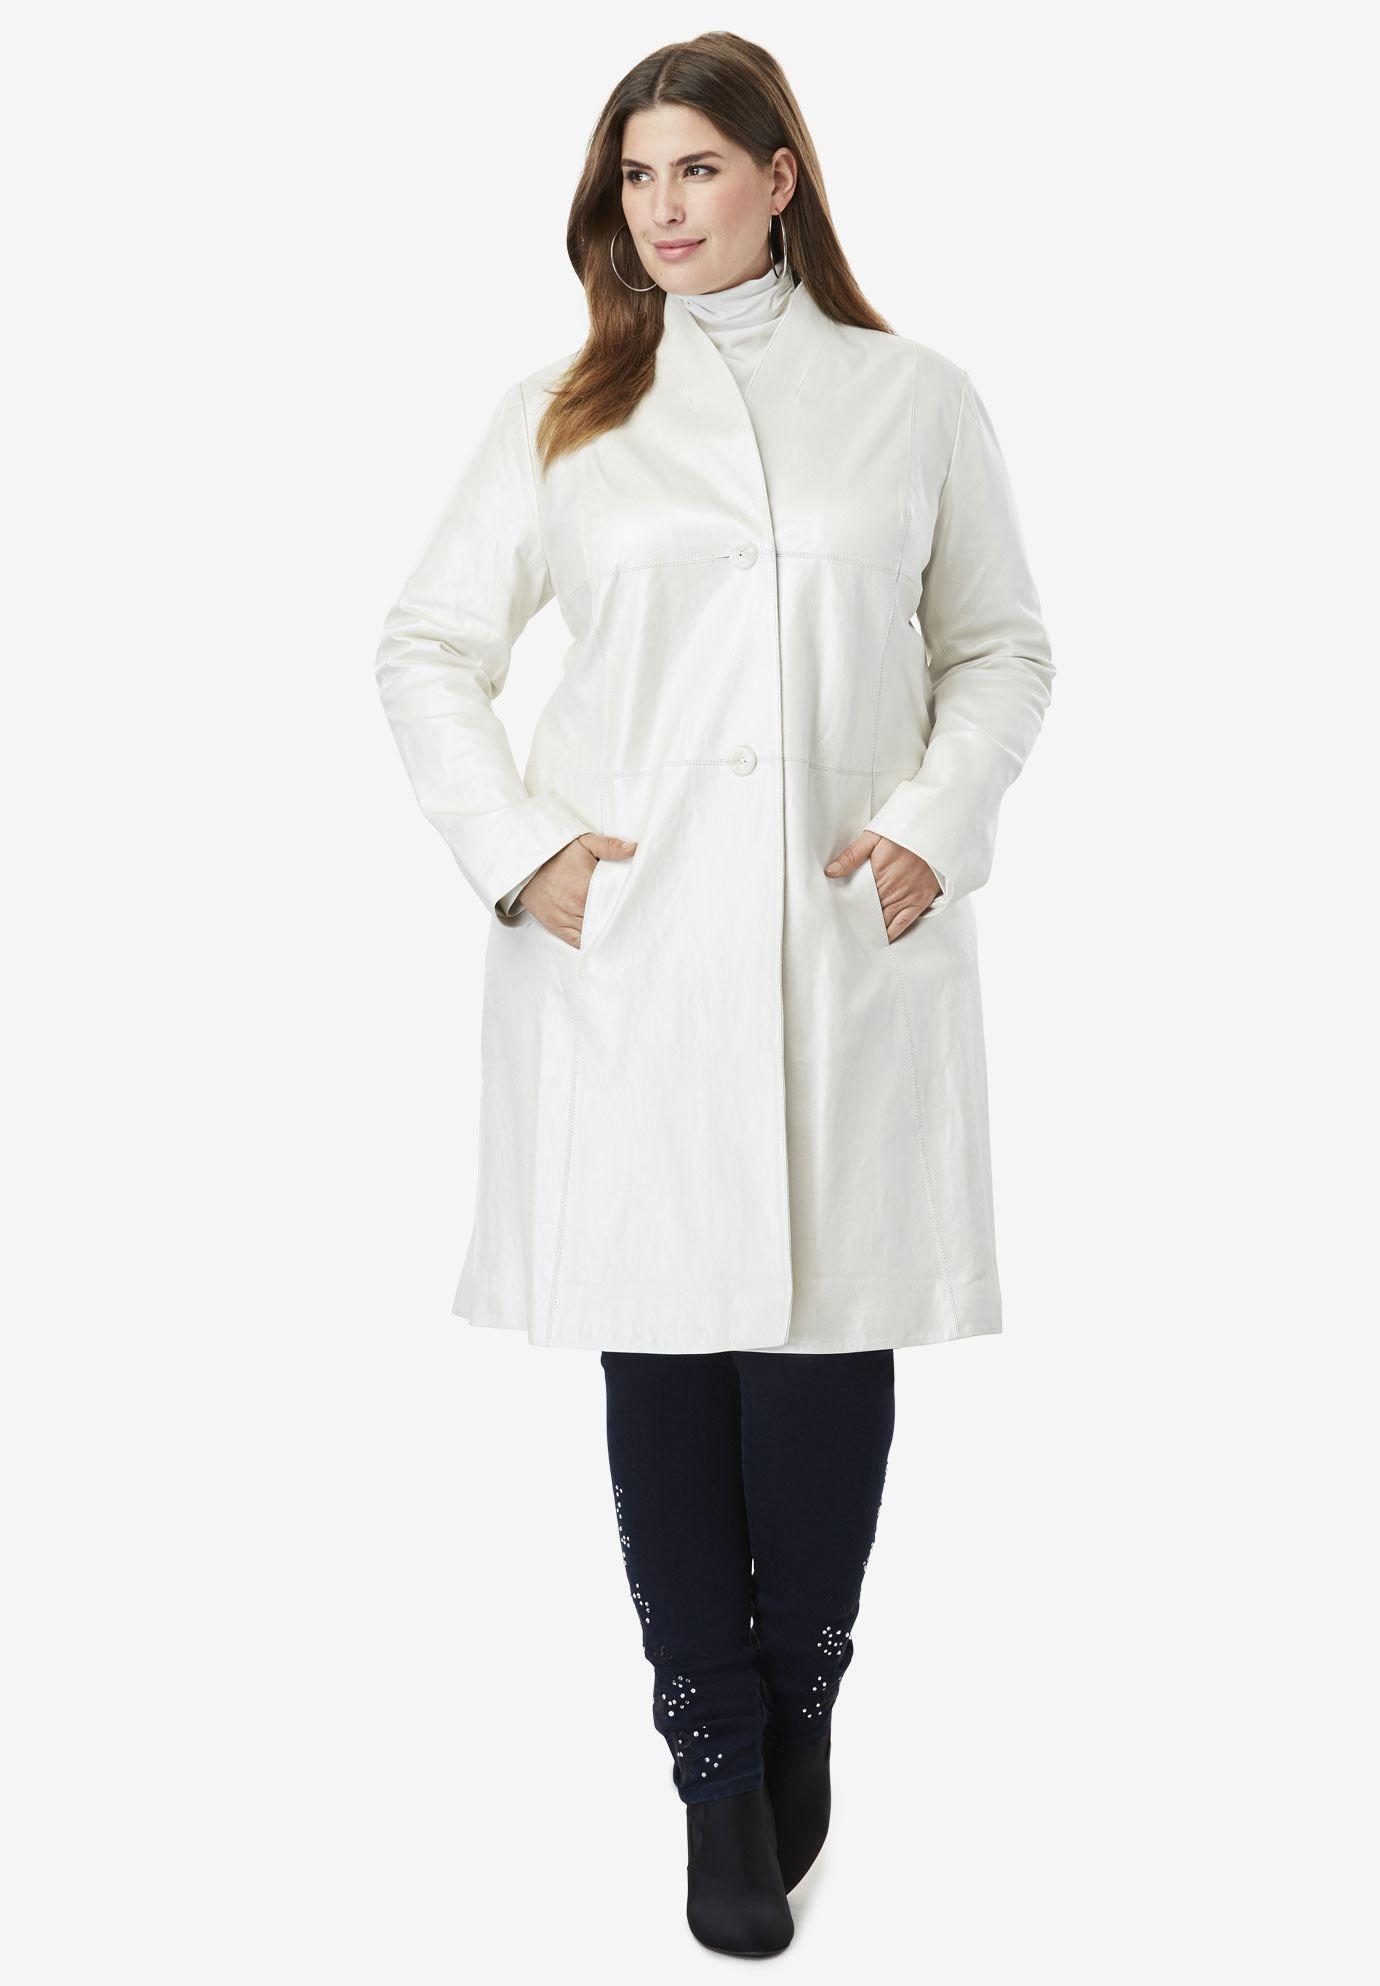 Leather Swing Coat Pearlized Ivory Plus Size Leather Jacket Swing Coats Plus Size Coats [ 1986 x 1380 Pixel ]